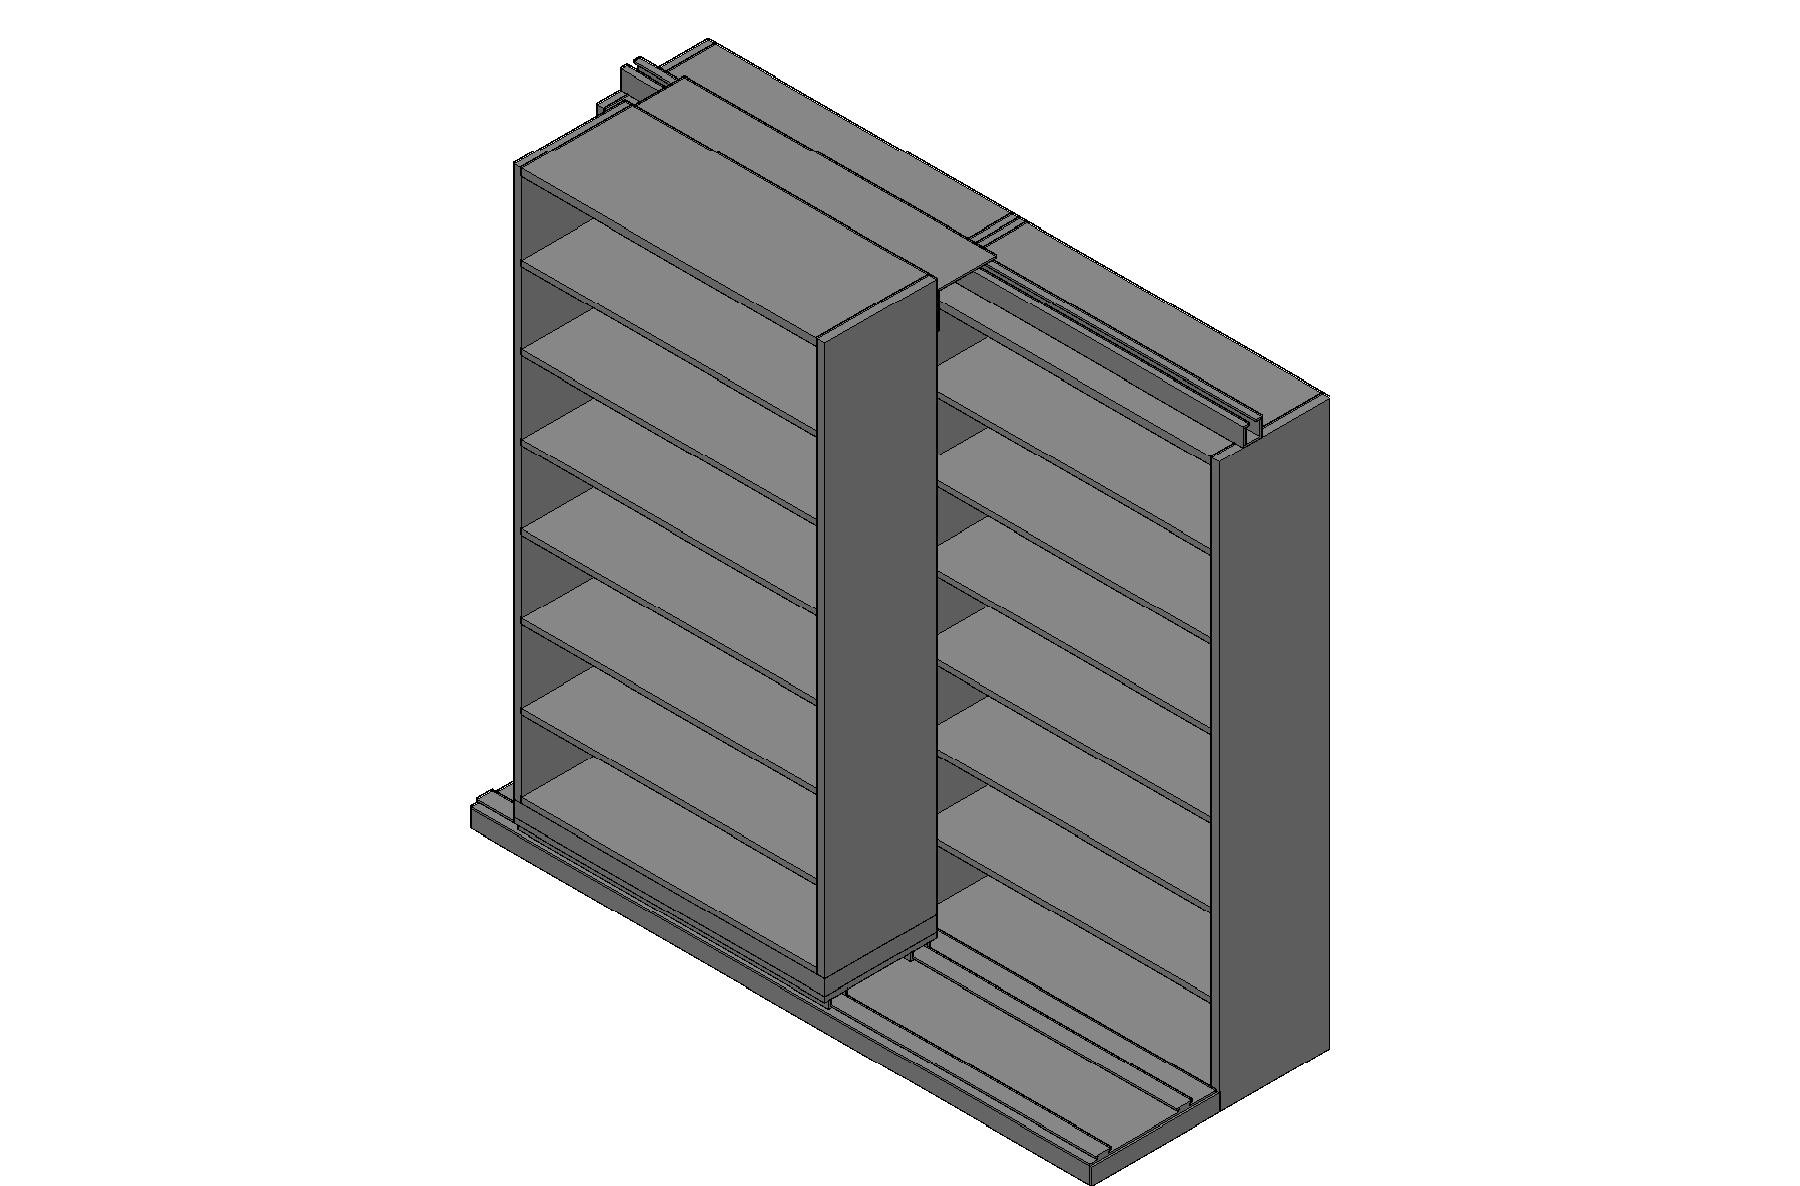 "Legal Size Sliding Shelves - 2 Rows Deep - 7 Levels - (42"" x 15"" Shelves) - 88"" Total Width"